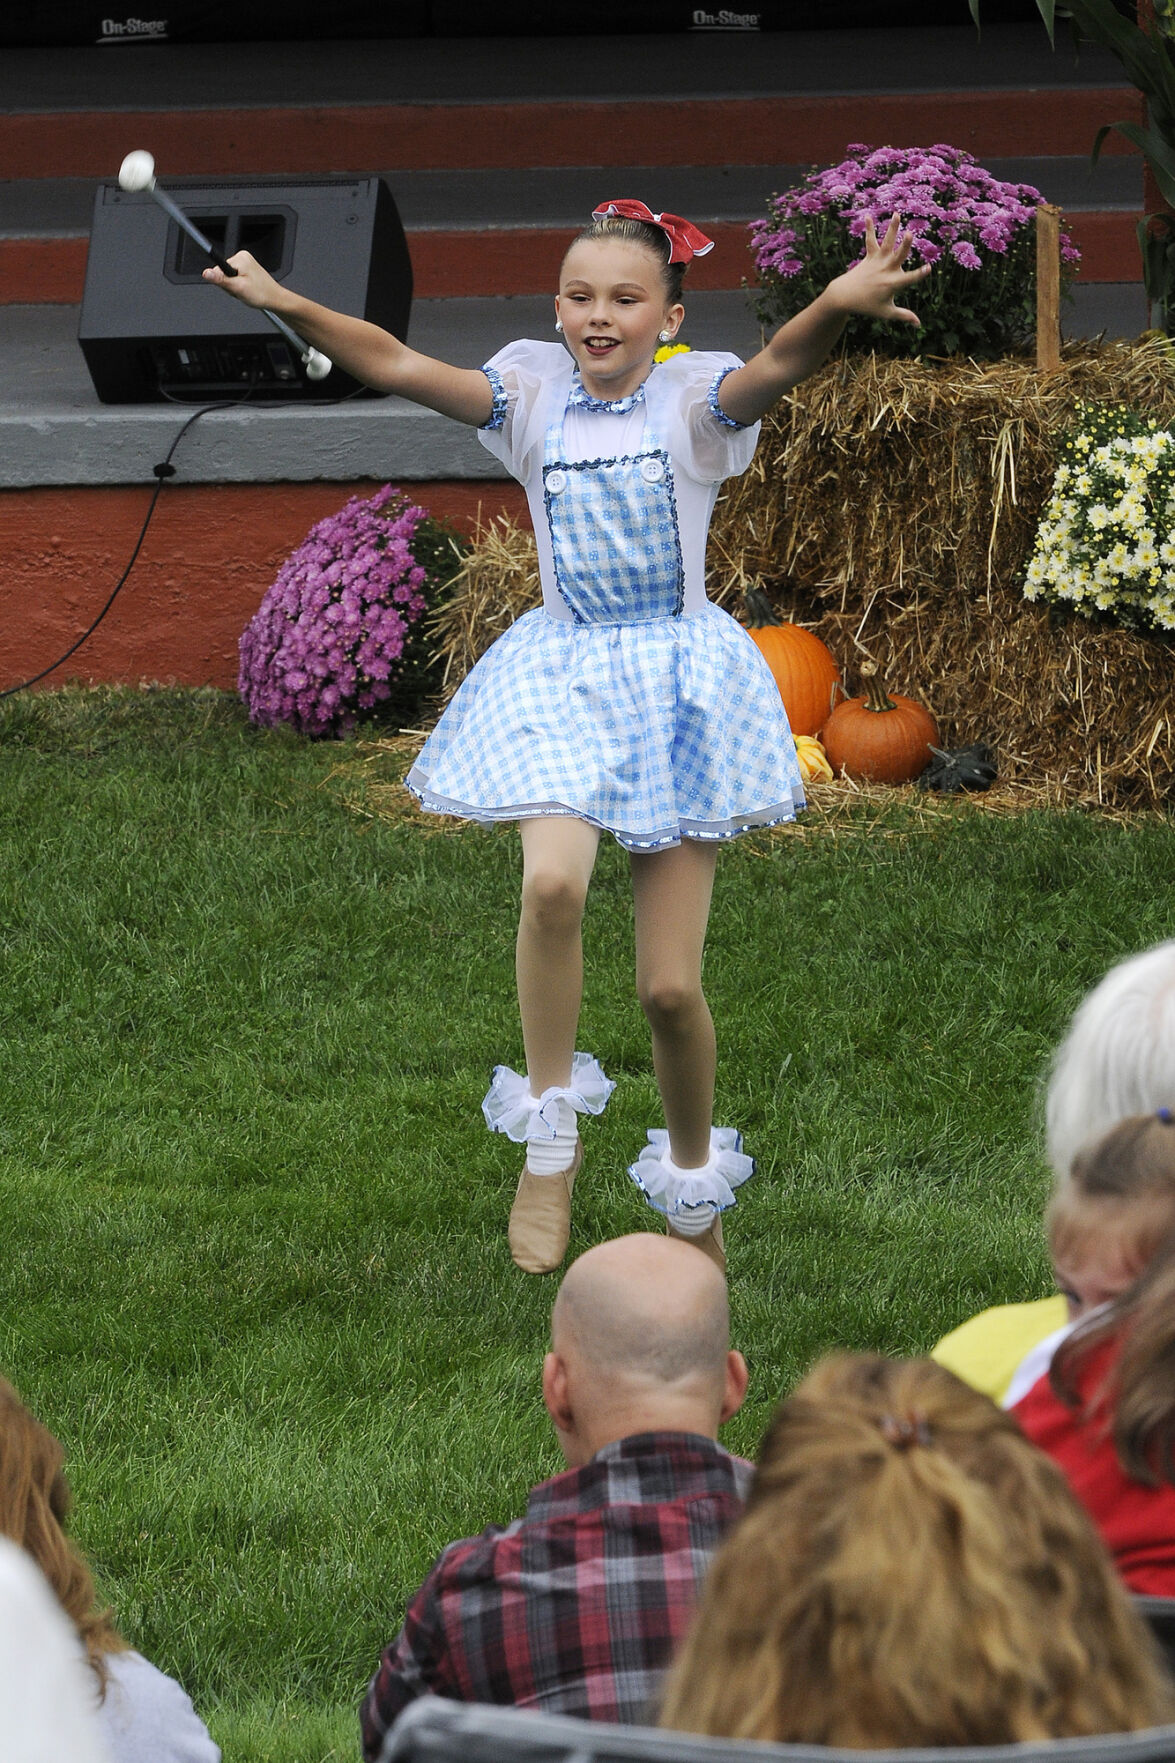 Derryfest celebrates community